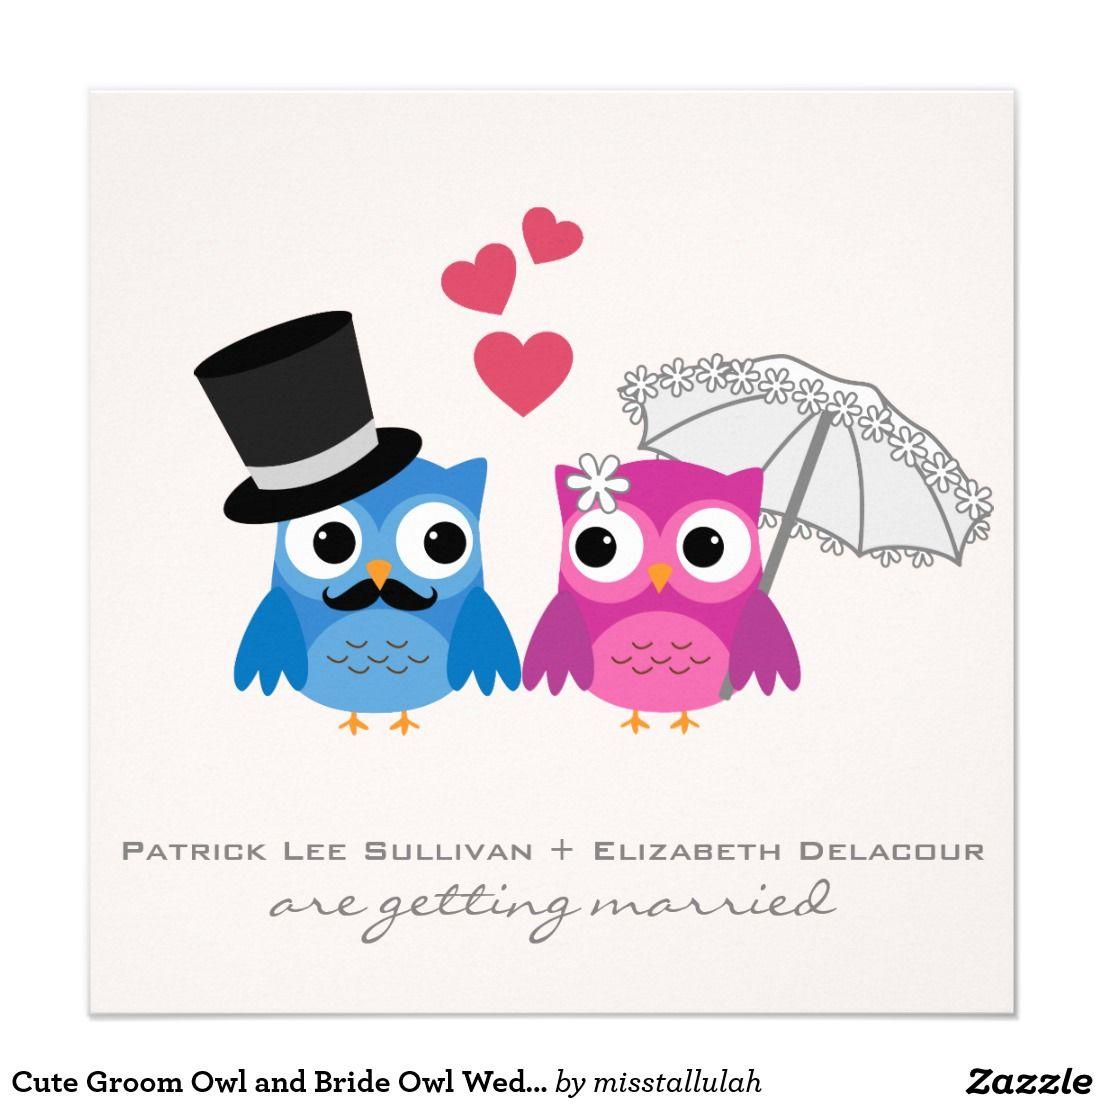 Cute Groom Owl and Bride Owl Wedding Invitation | Pinterest | Owl ...